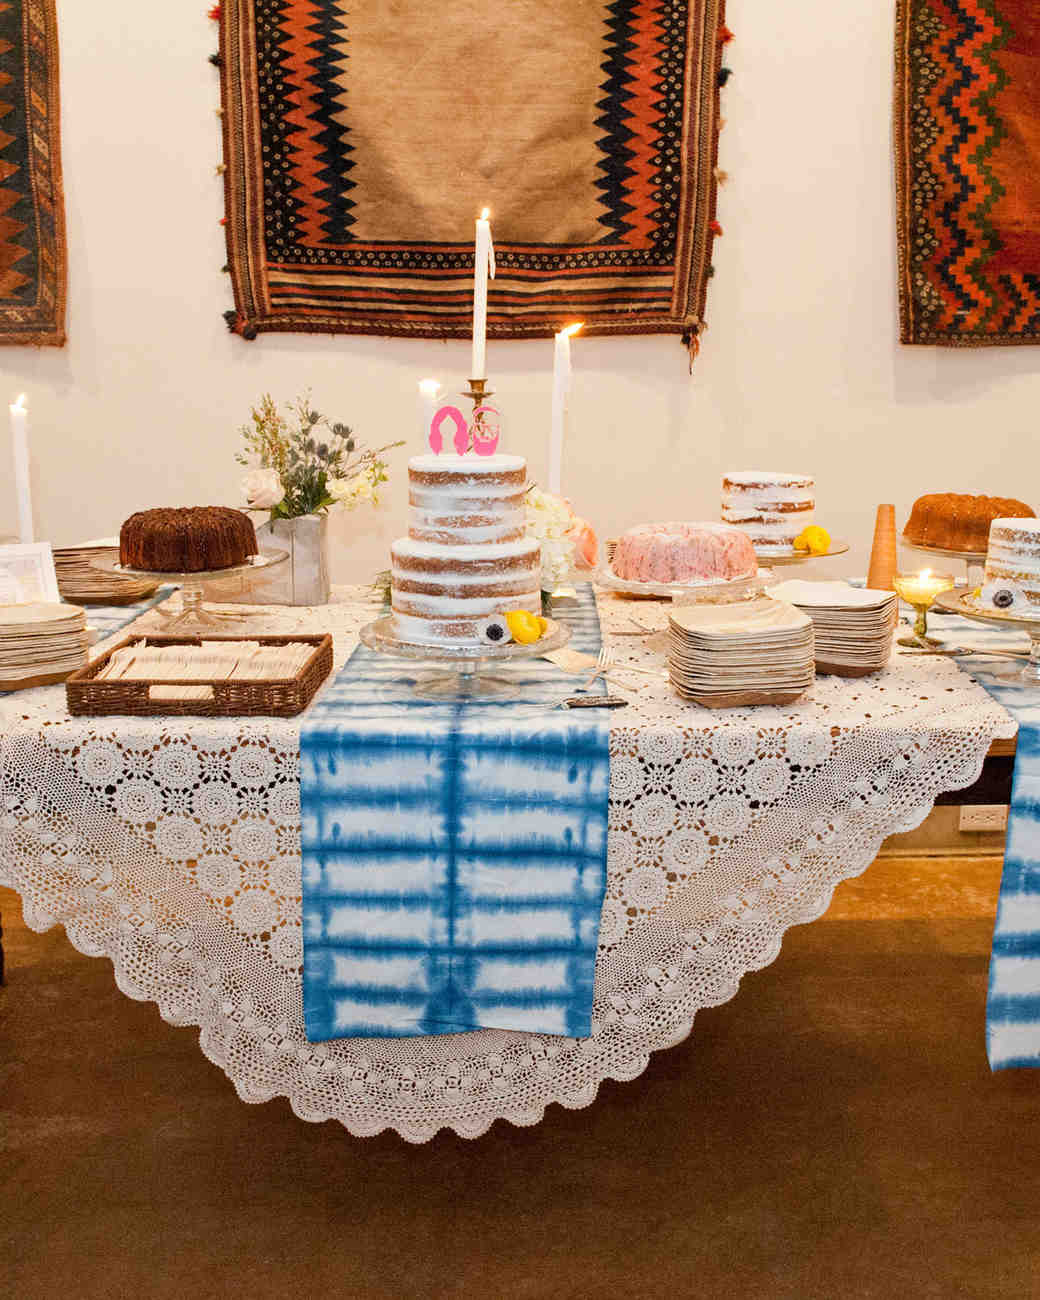 abby-chris-wedding-texas-desserts-0718-s112832-0516.jpg